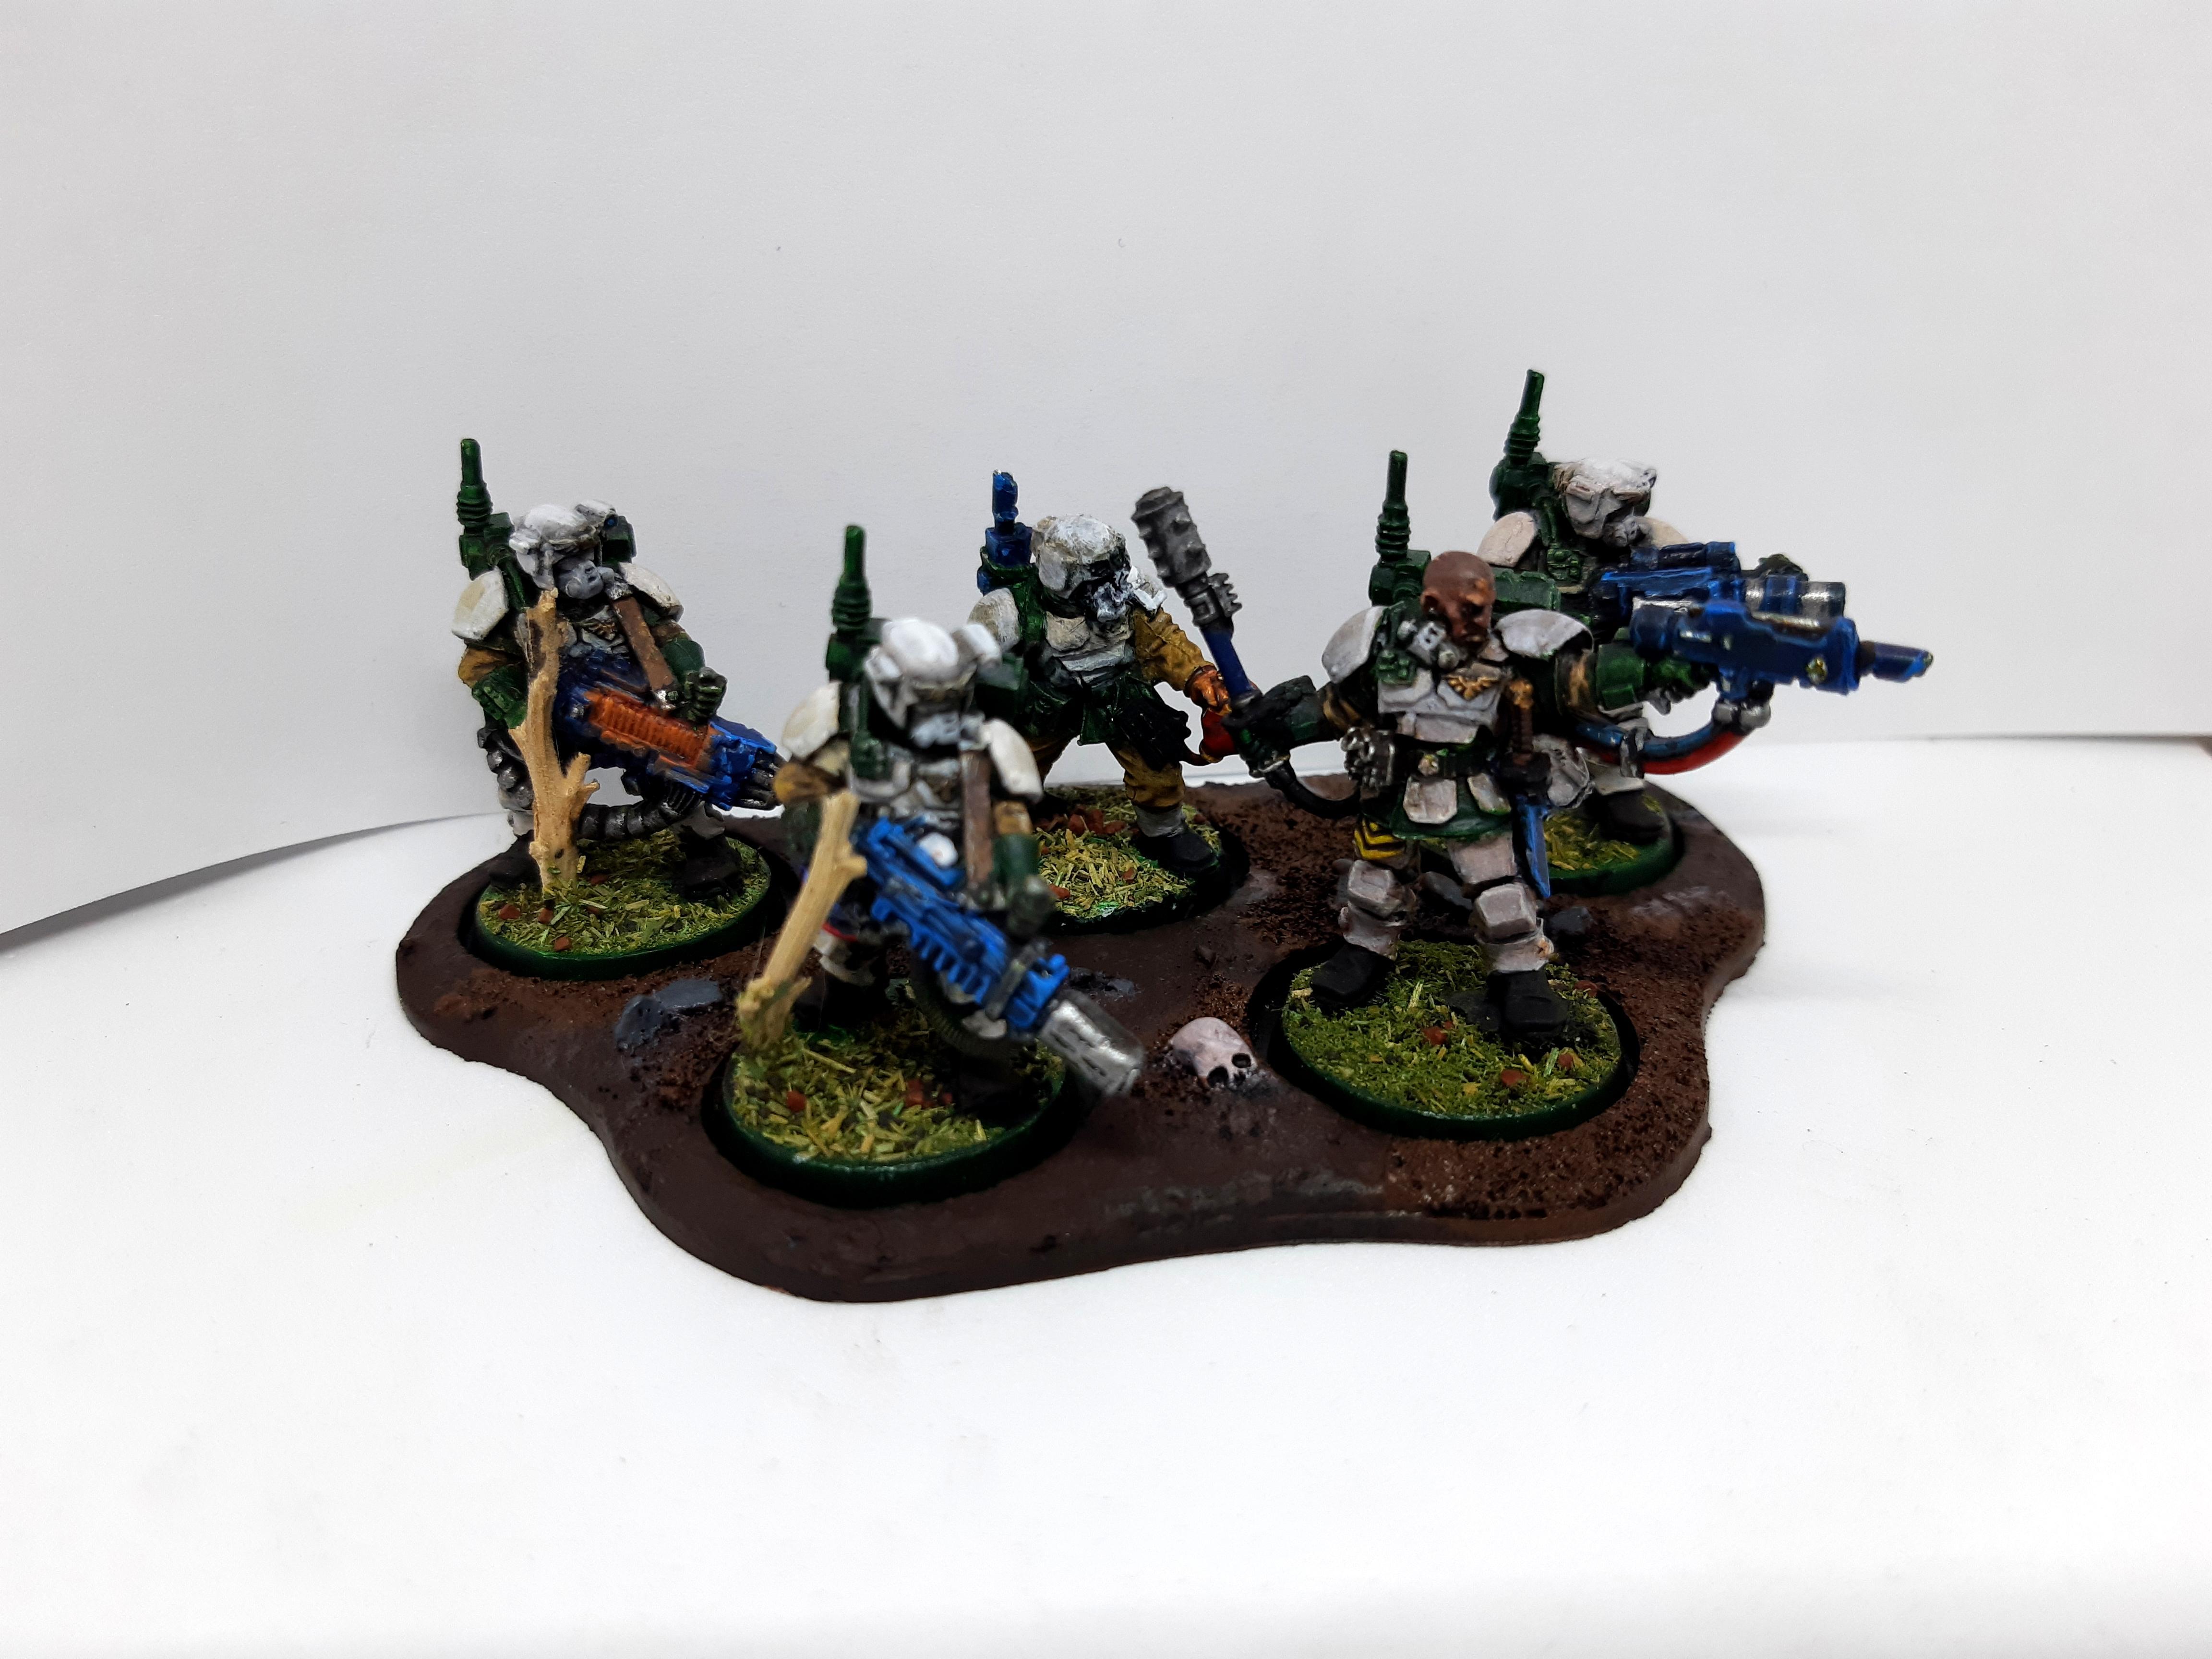 Imperial Guard, Kasrkin, Metal, Warhammer 40,000